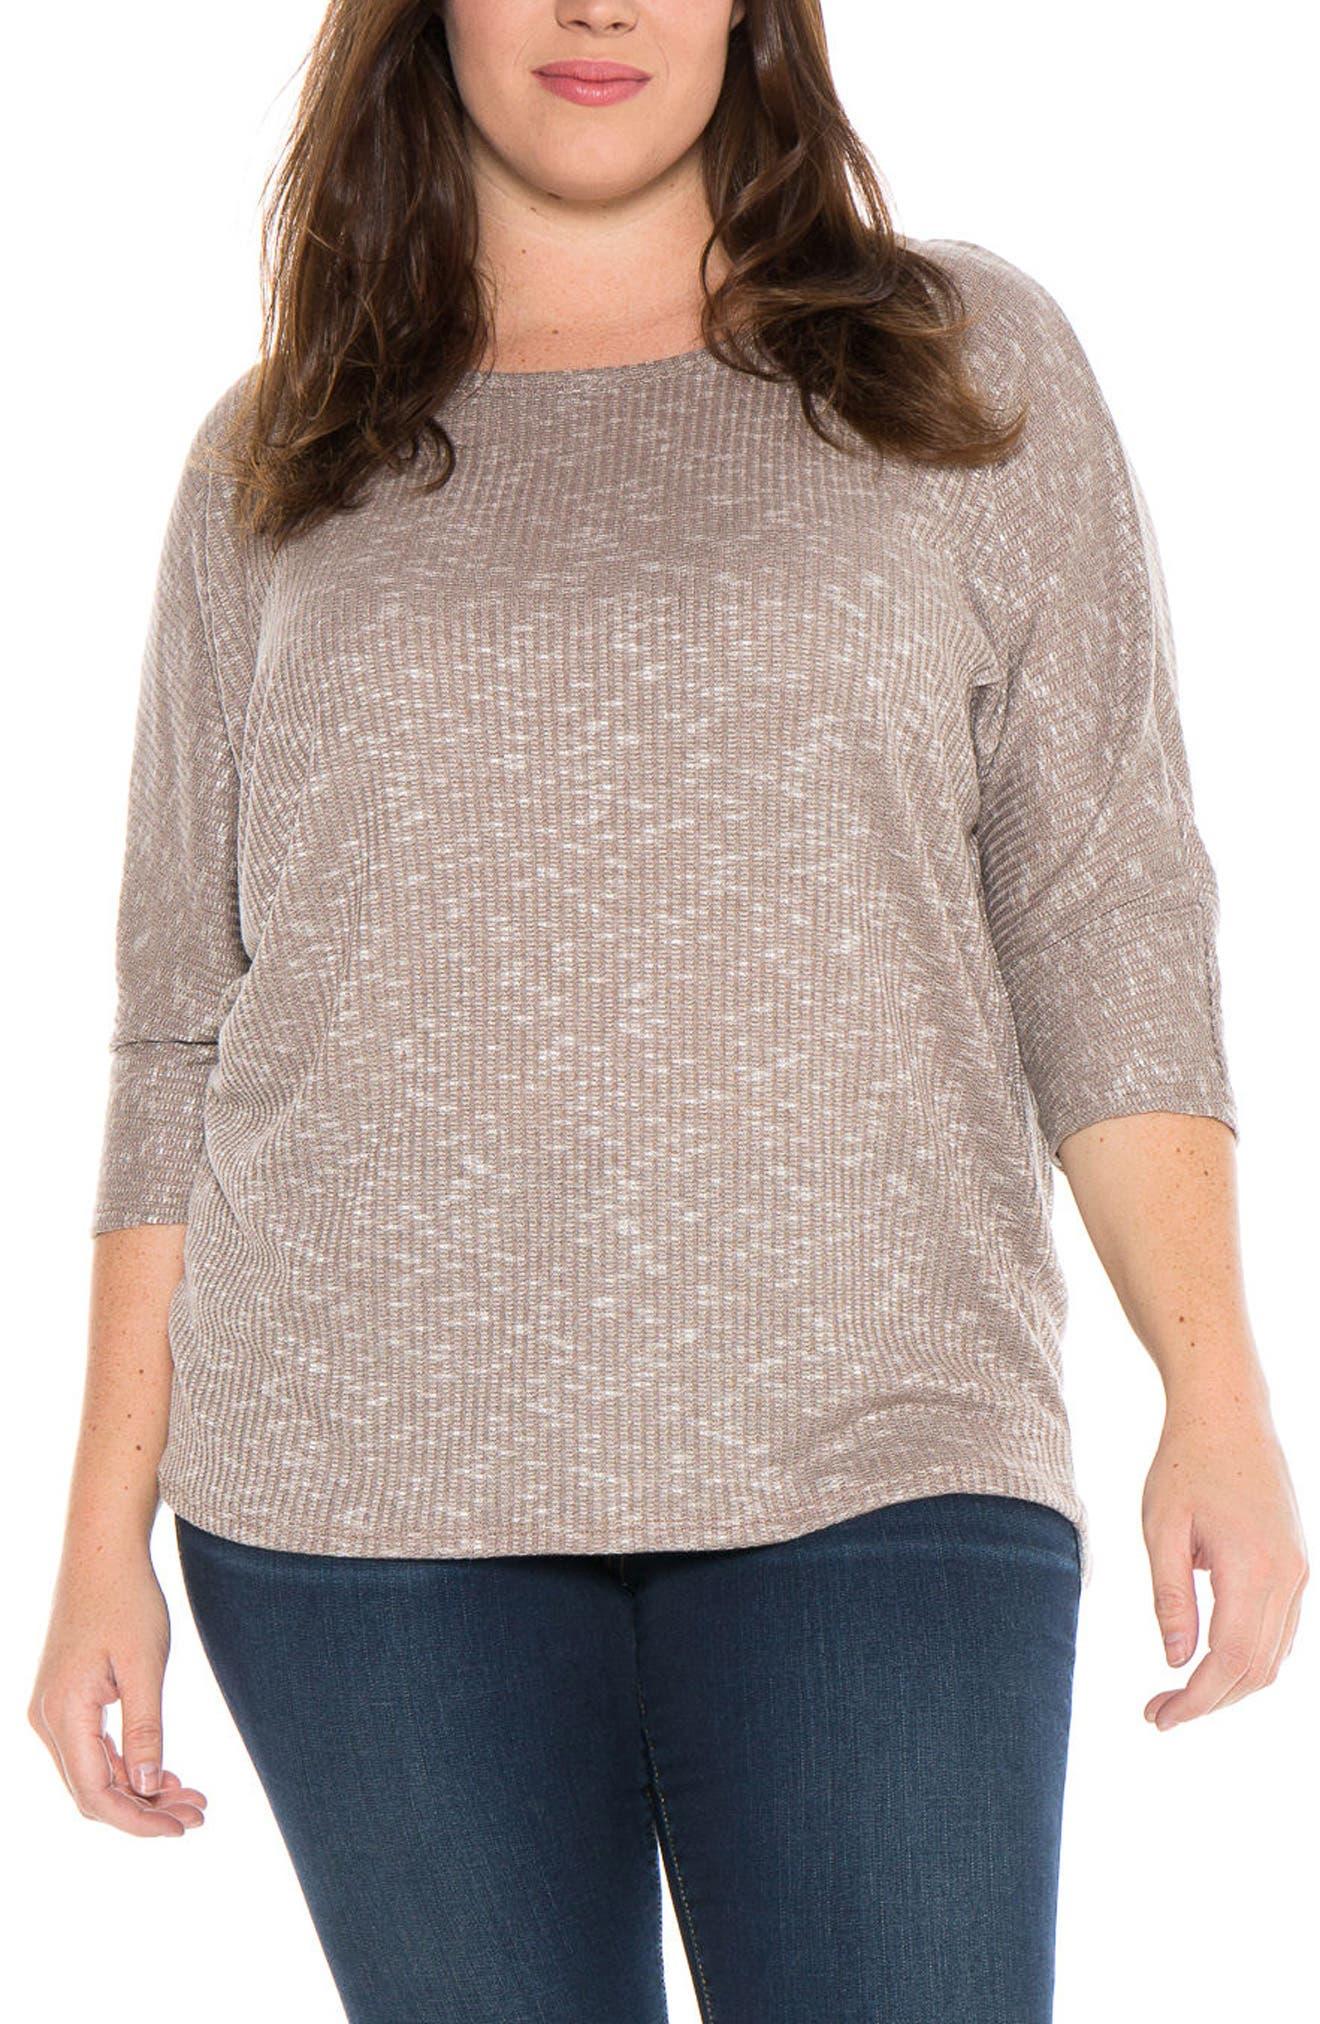 SLINK Jeans Marble Knit Dolman Top (Plus Size)